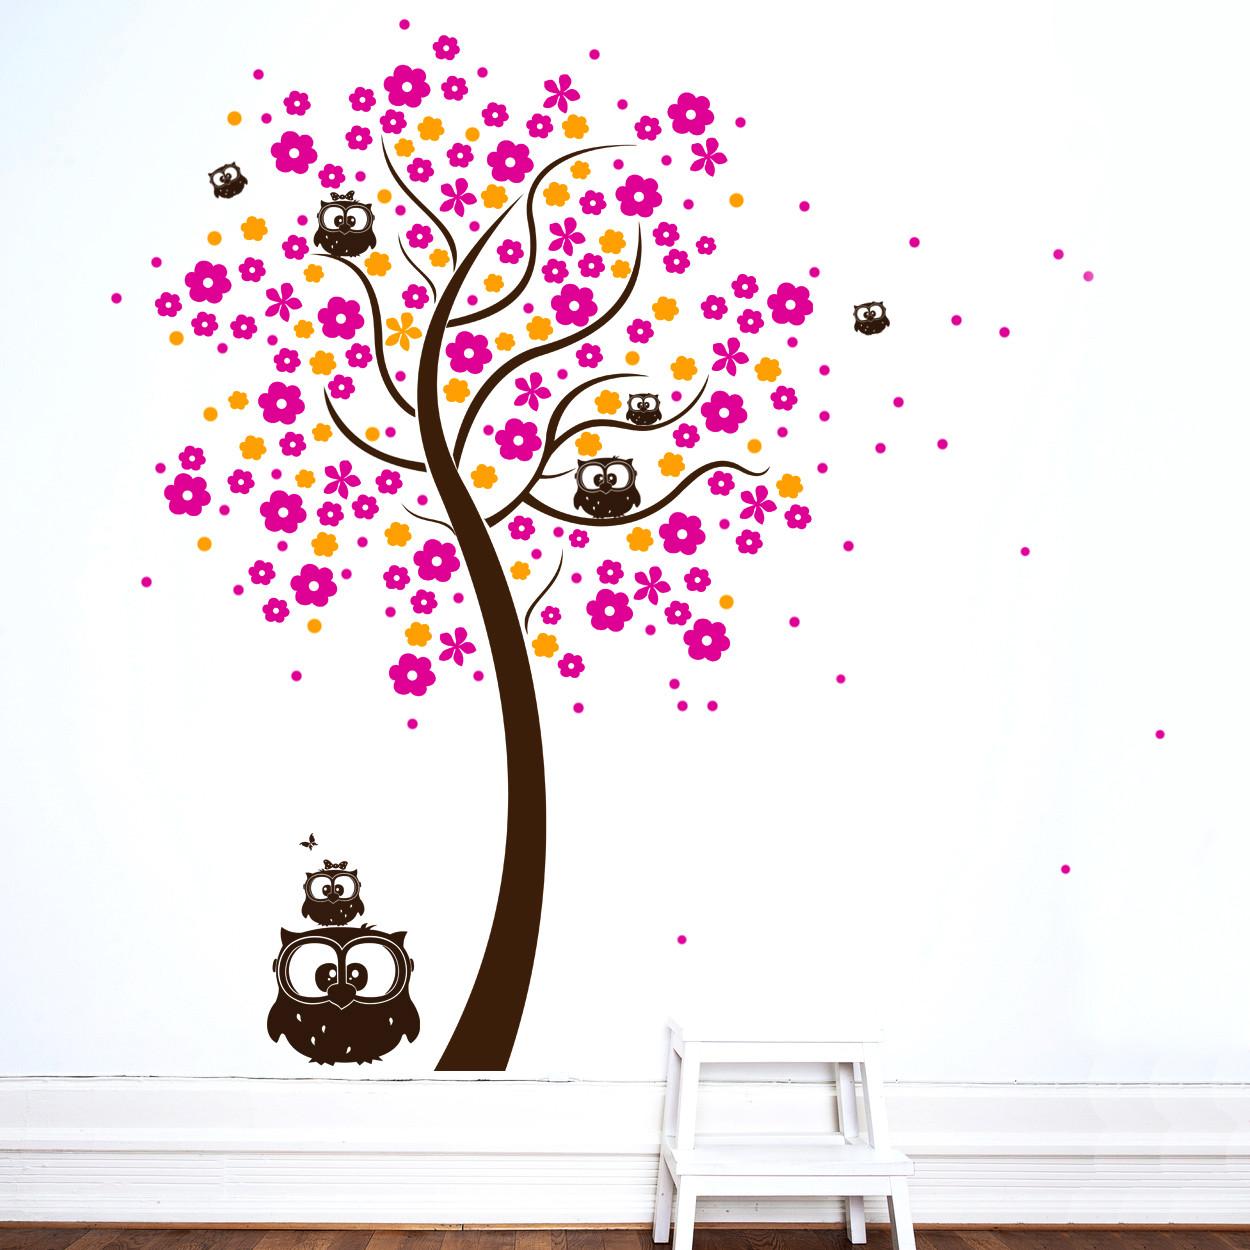 Wandtattoo baum eulenbaum mit bl ten dreifarbig m1030 - Wandtattoo eulenbaum ...